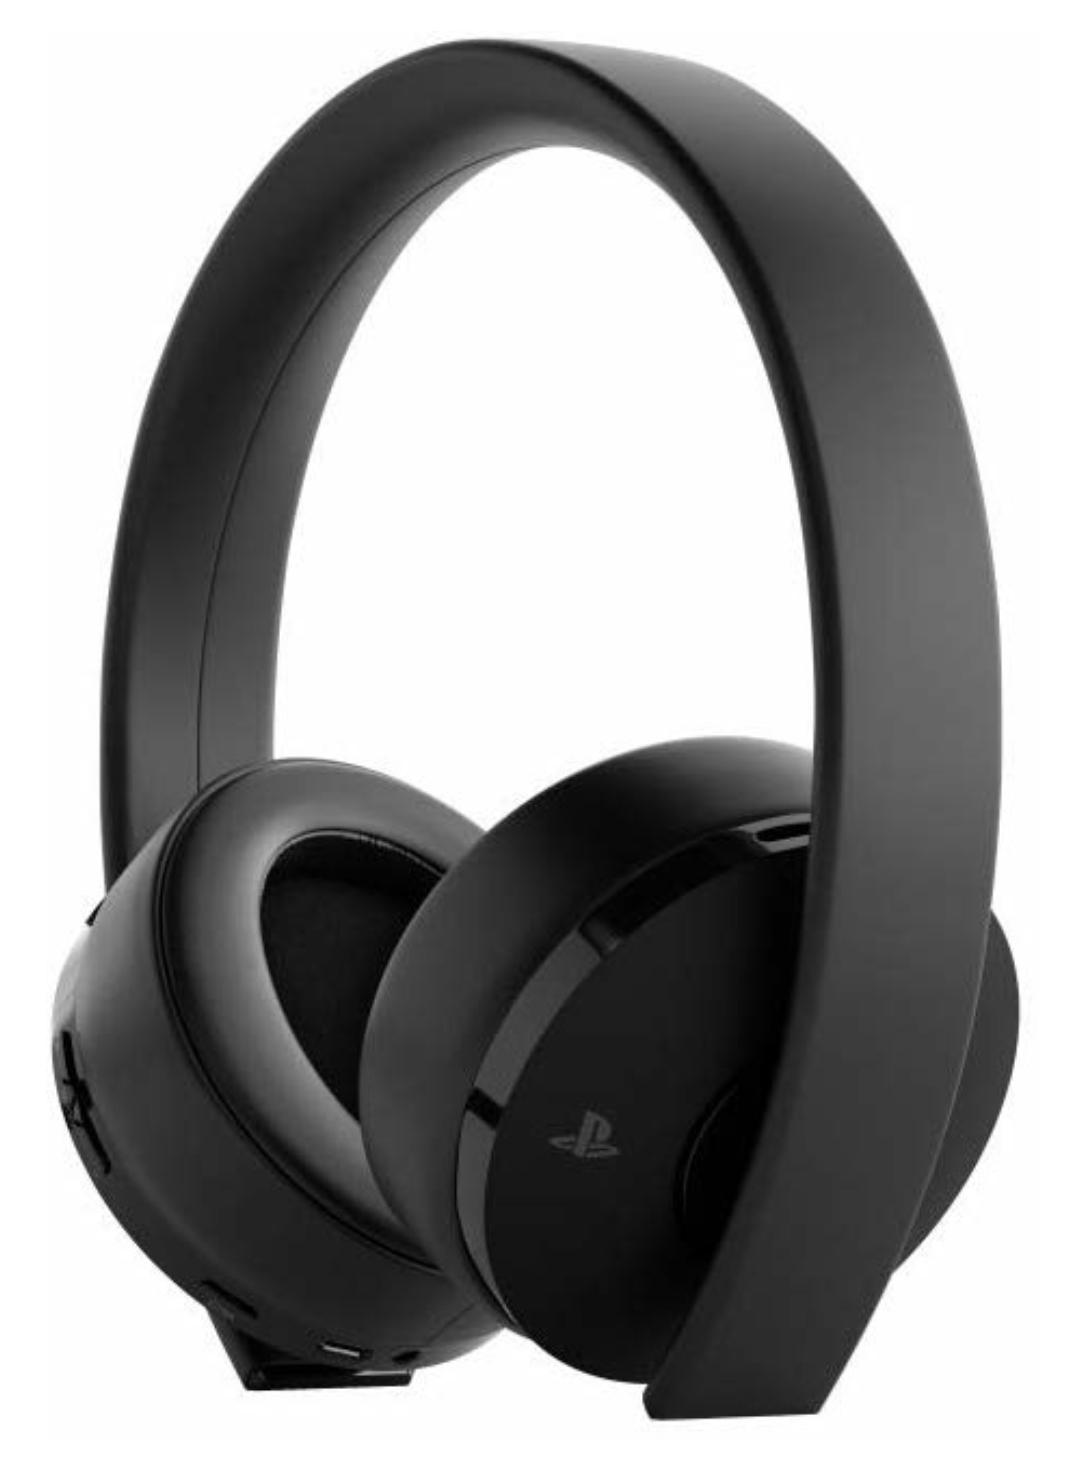 Sony PS4 Wireless Gold 7.1 Surround Gaming Headset, Schwarz